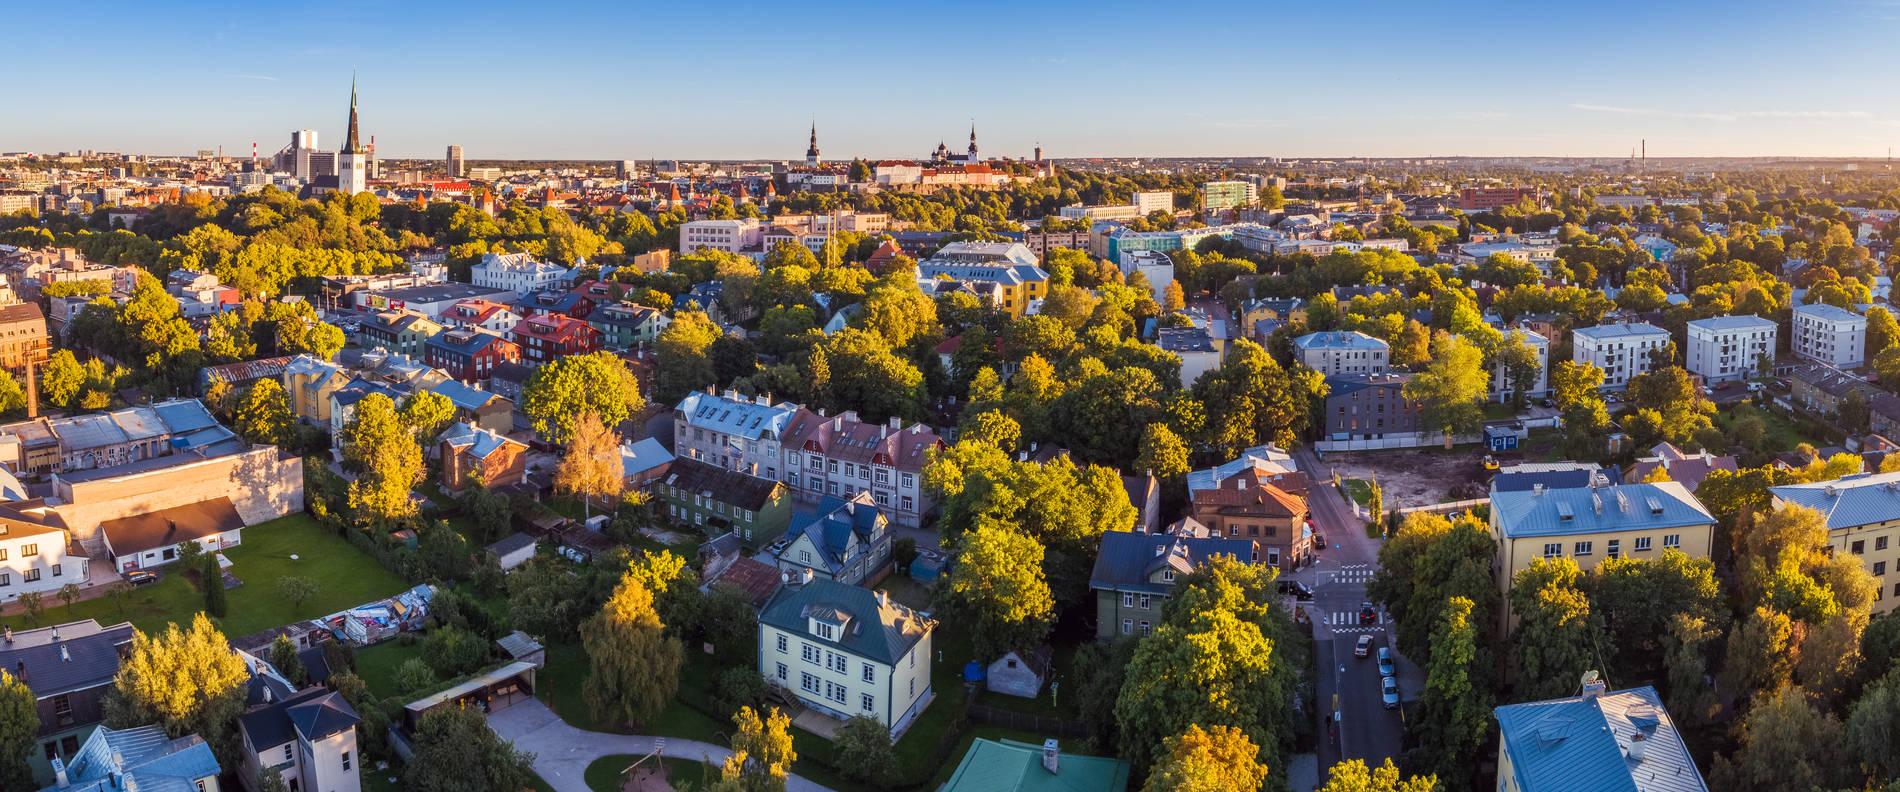 Aerial view of Kalamaja, a green and bohemian neighbourghood in Tallinn, Estonia